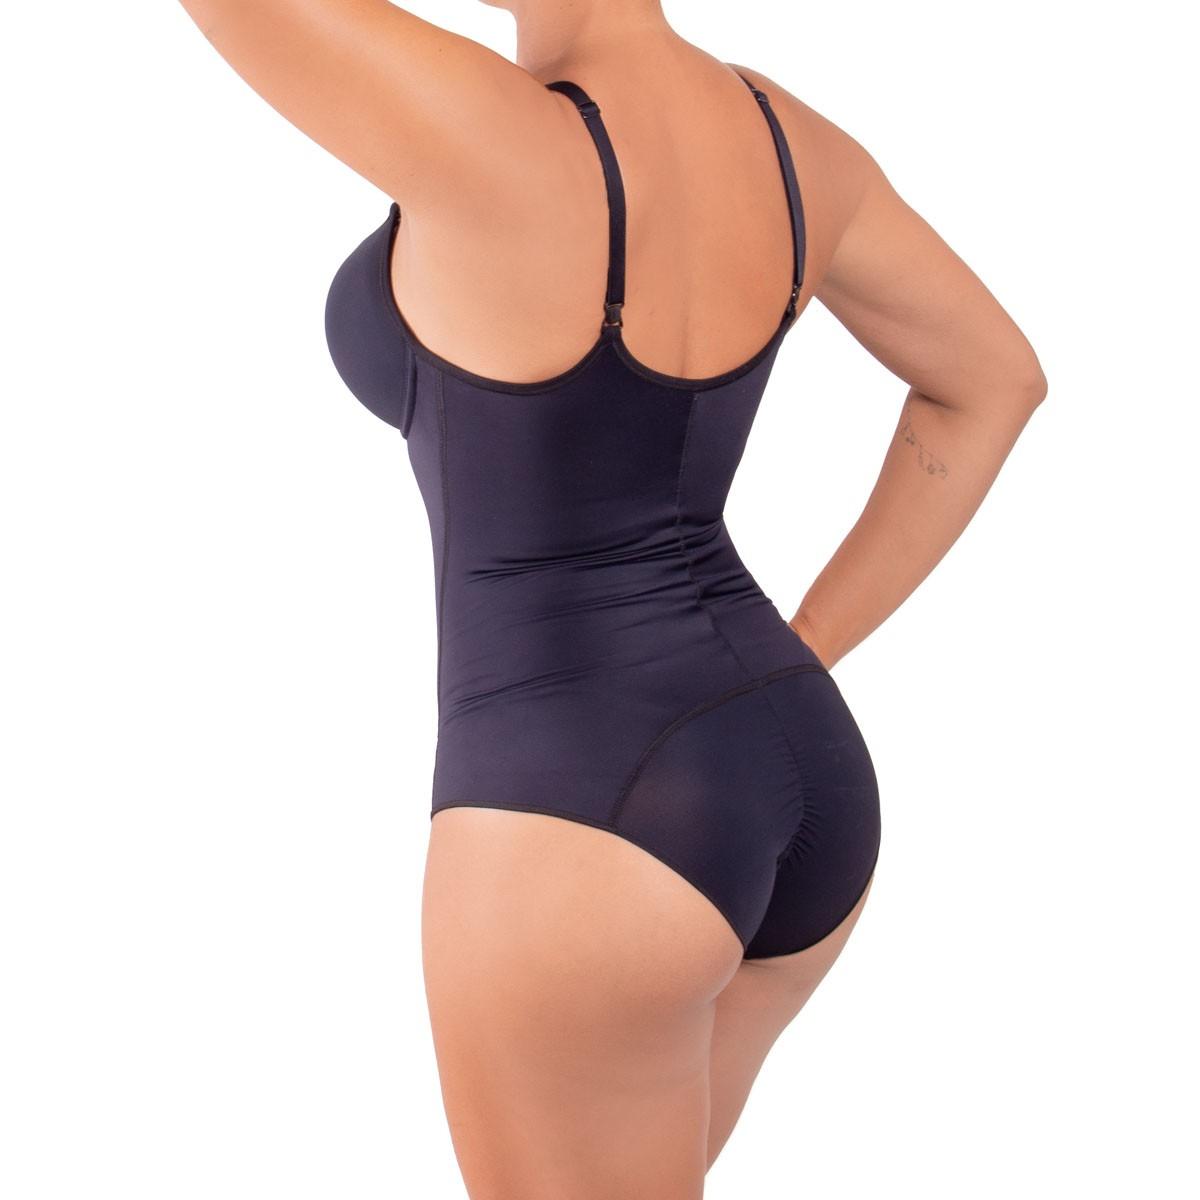 Cinta modeladora feminina body redutor afina cintura bojo Liebe